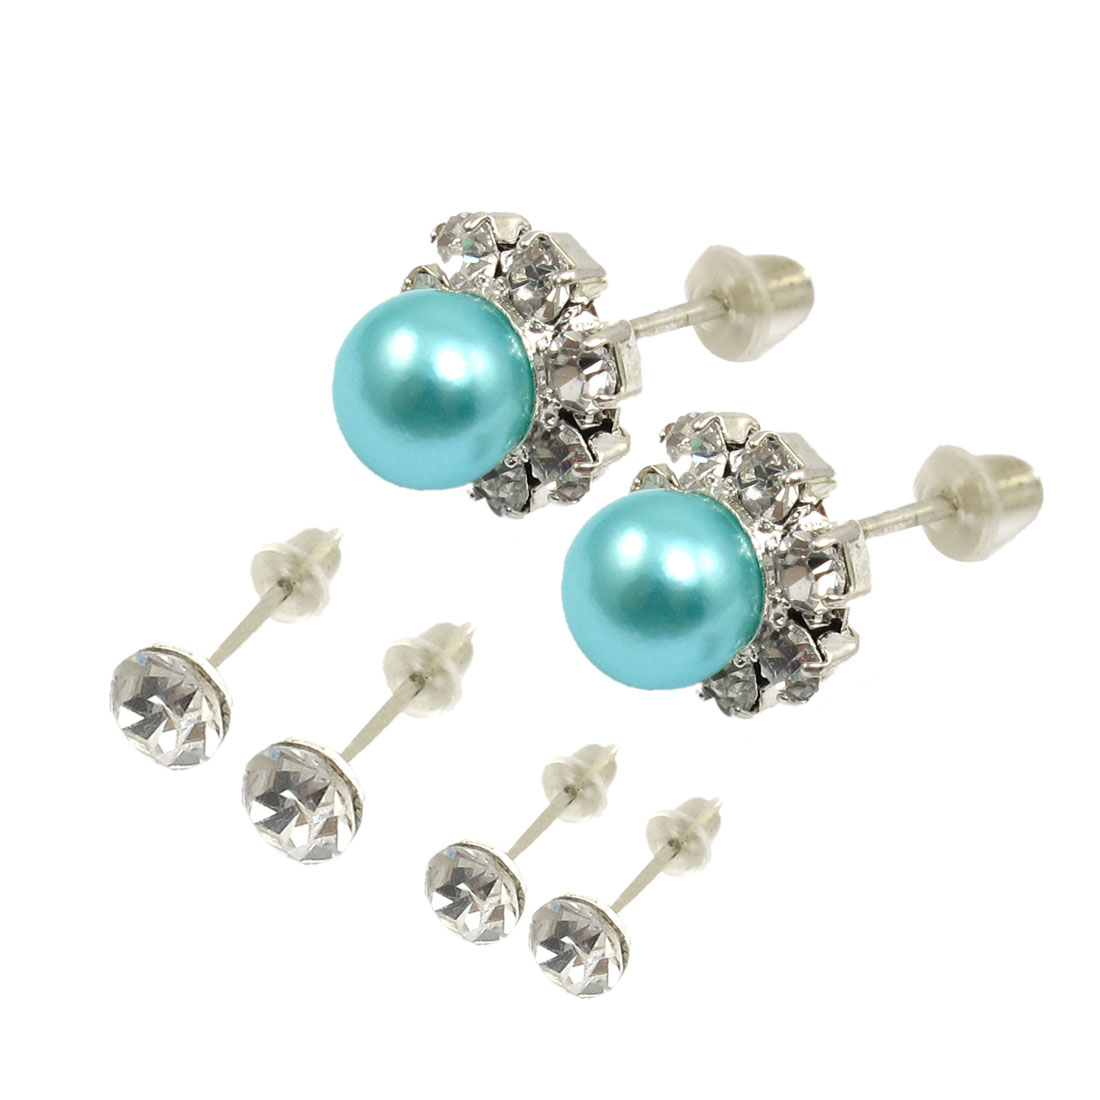 Light Blue Bead Rhinestone Inlaid Earrings Stud For Women 6 Pcs